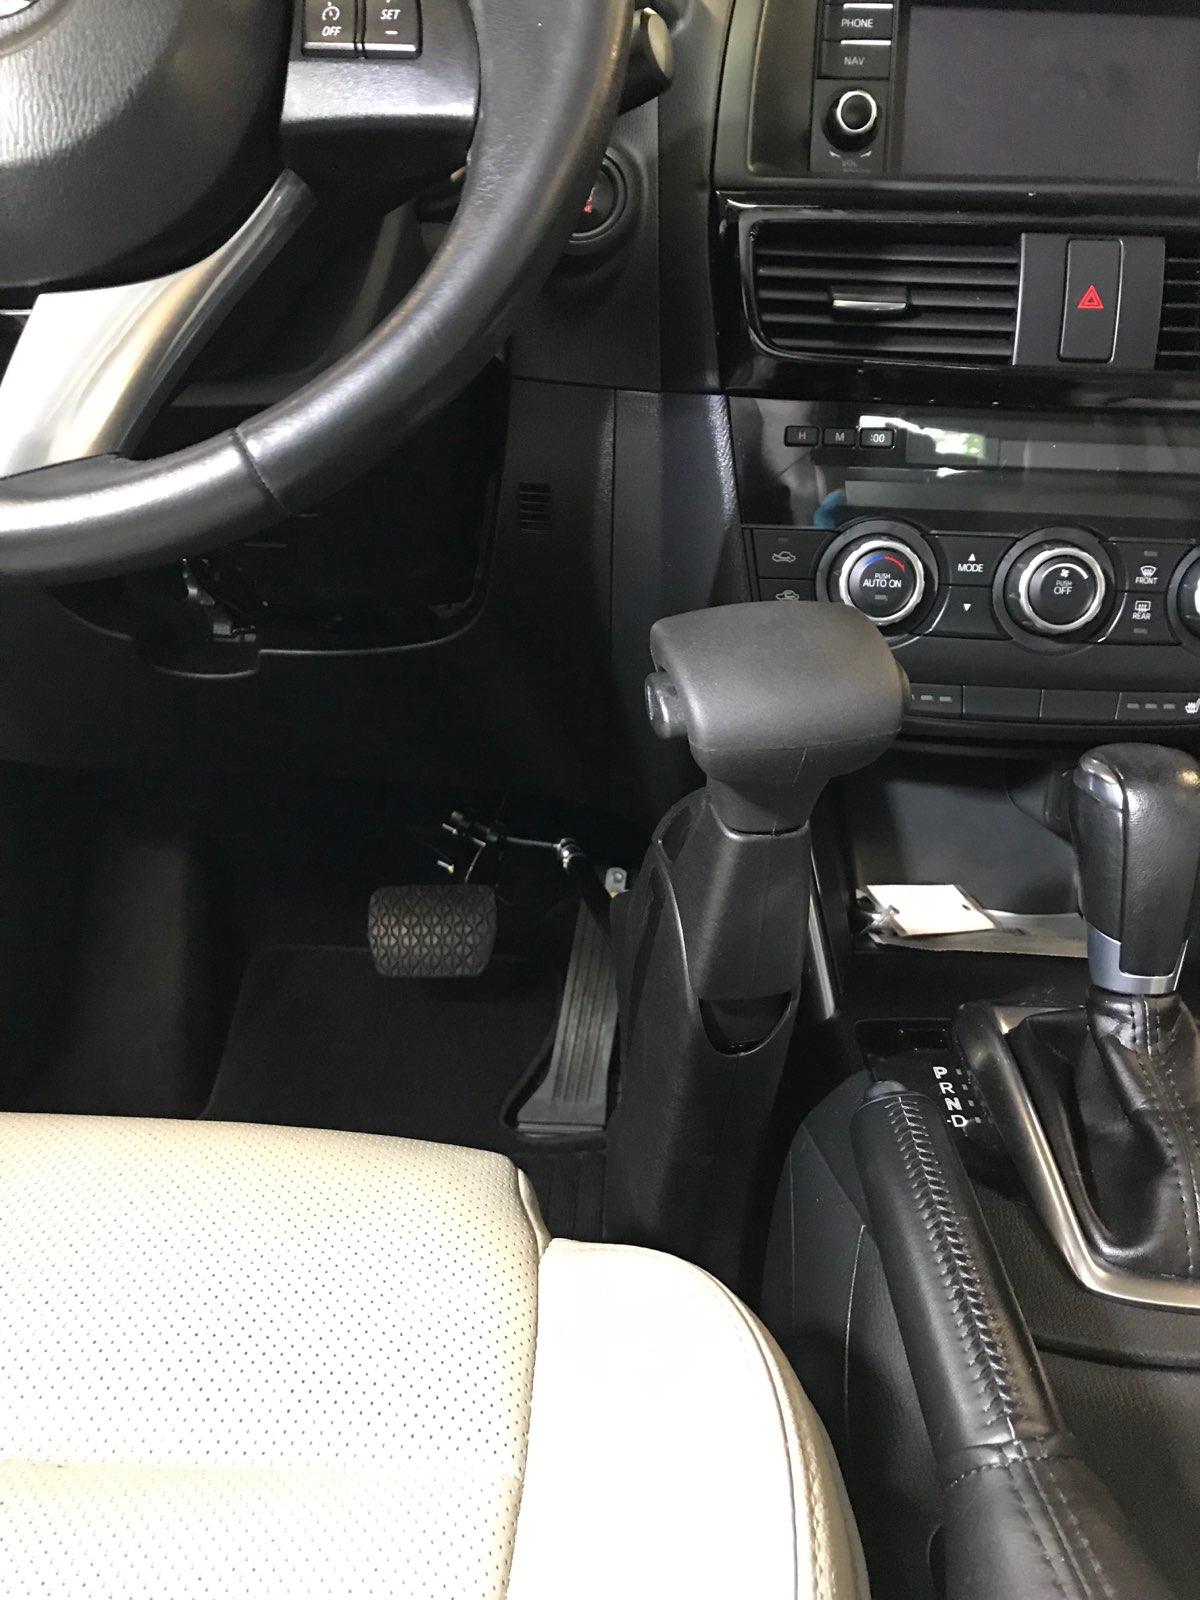 veigel compact hand controls